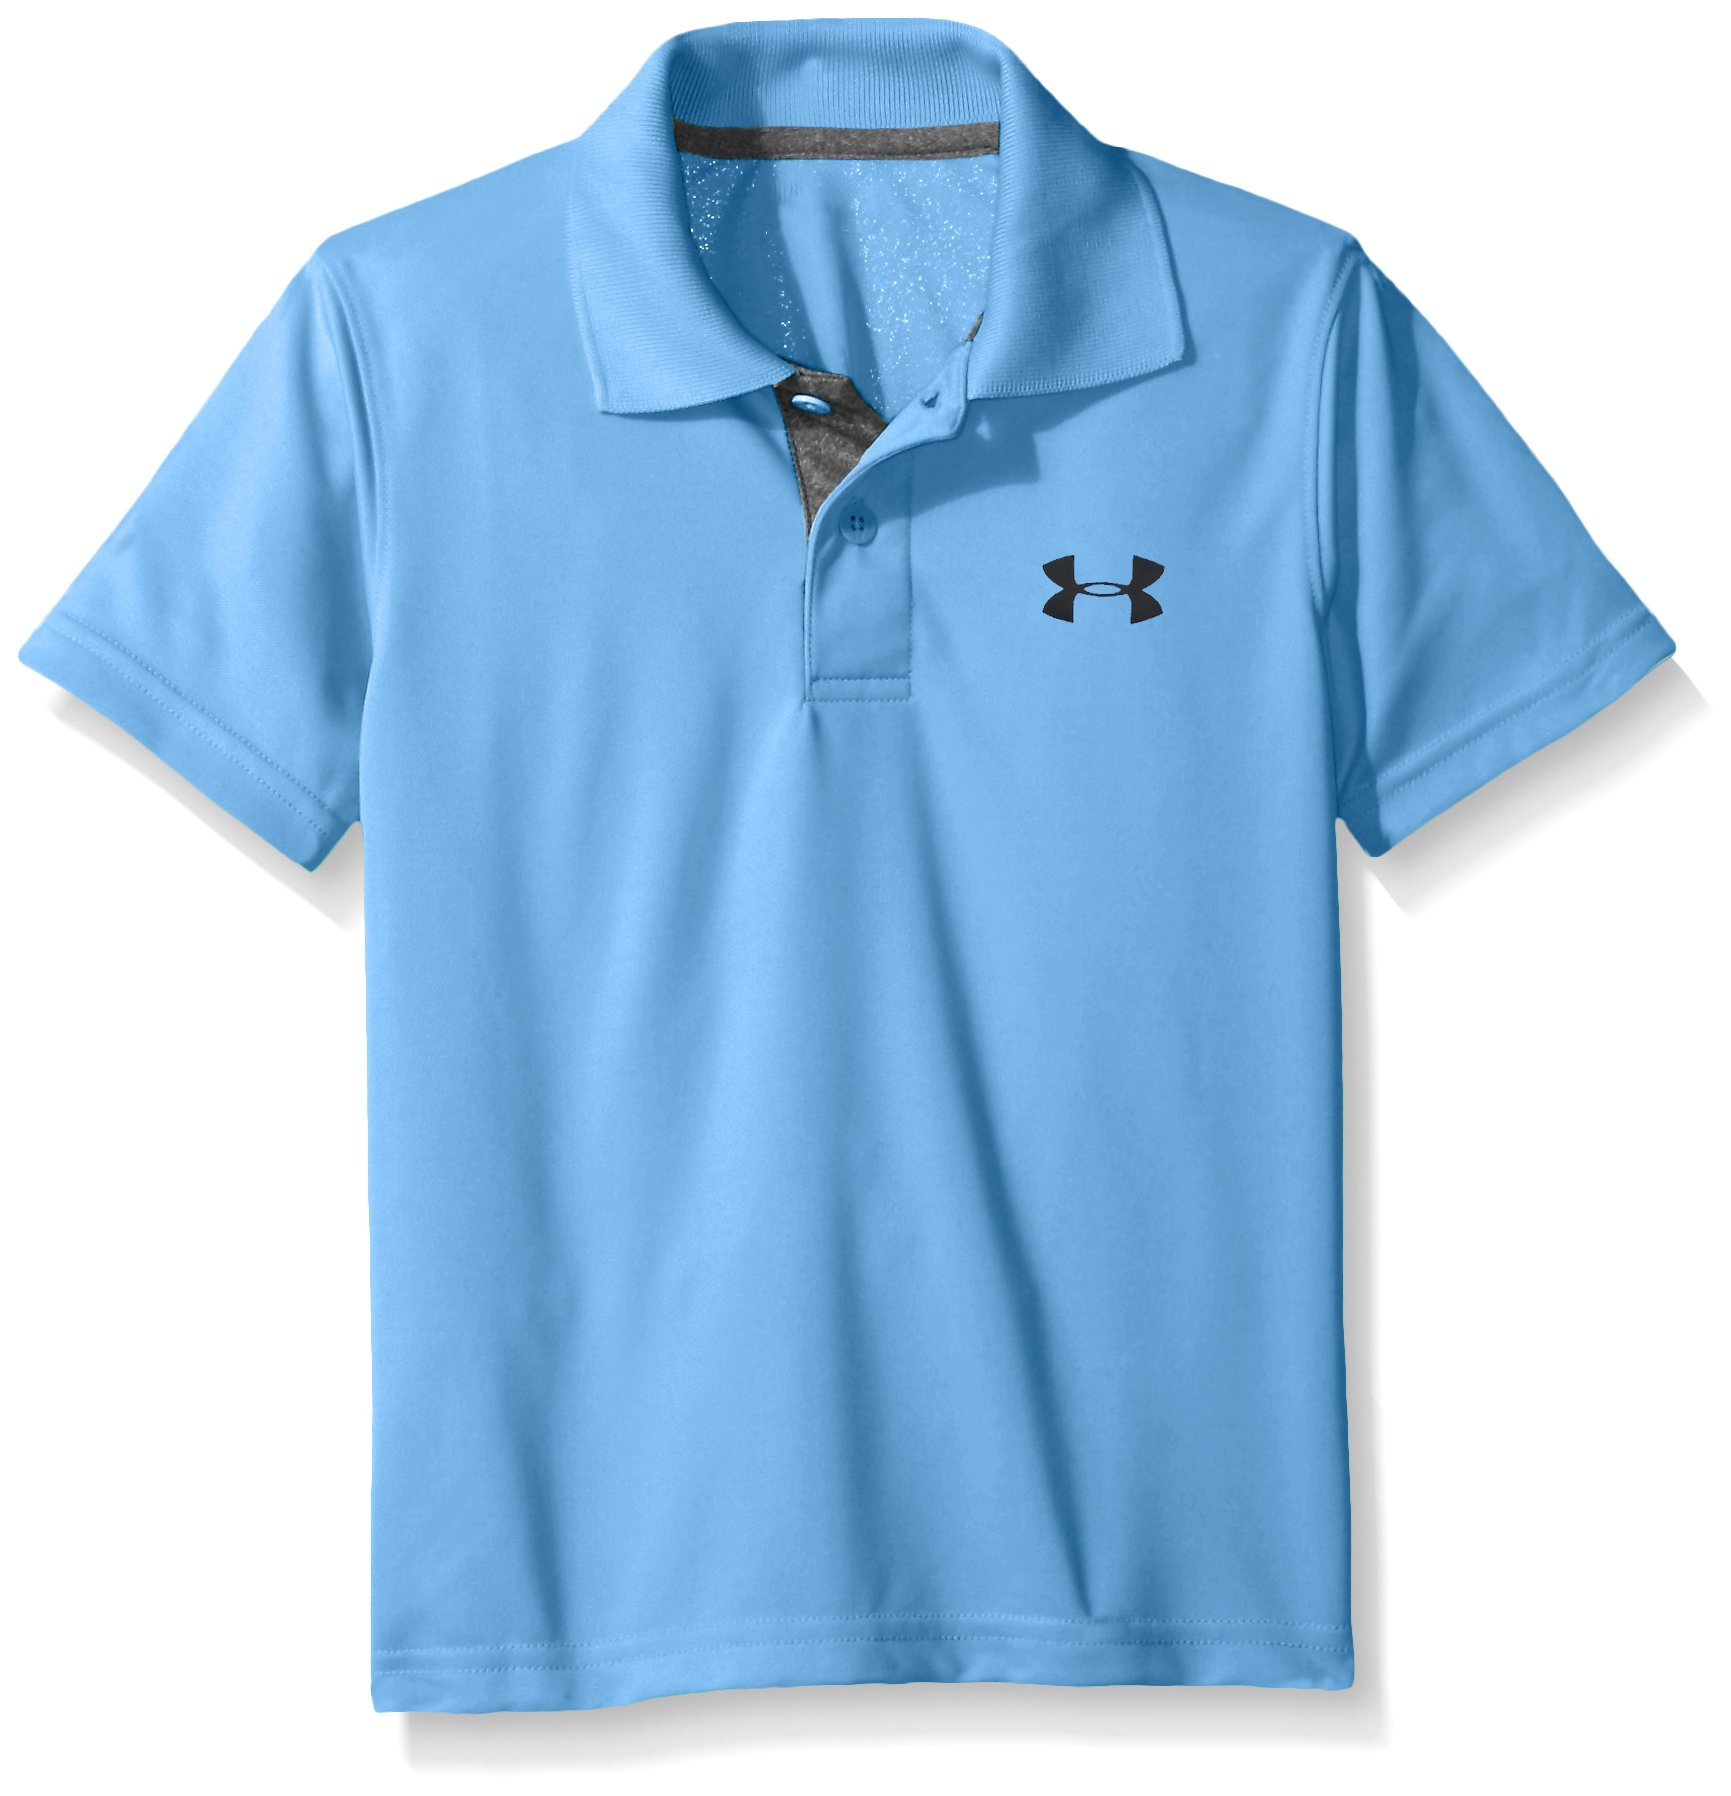 Under Armour Boys' Little Ua Logo Short Sleeve Polo, Water, 6 by Under Armour